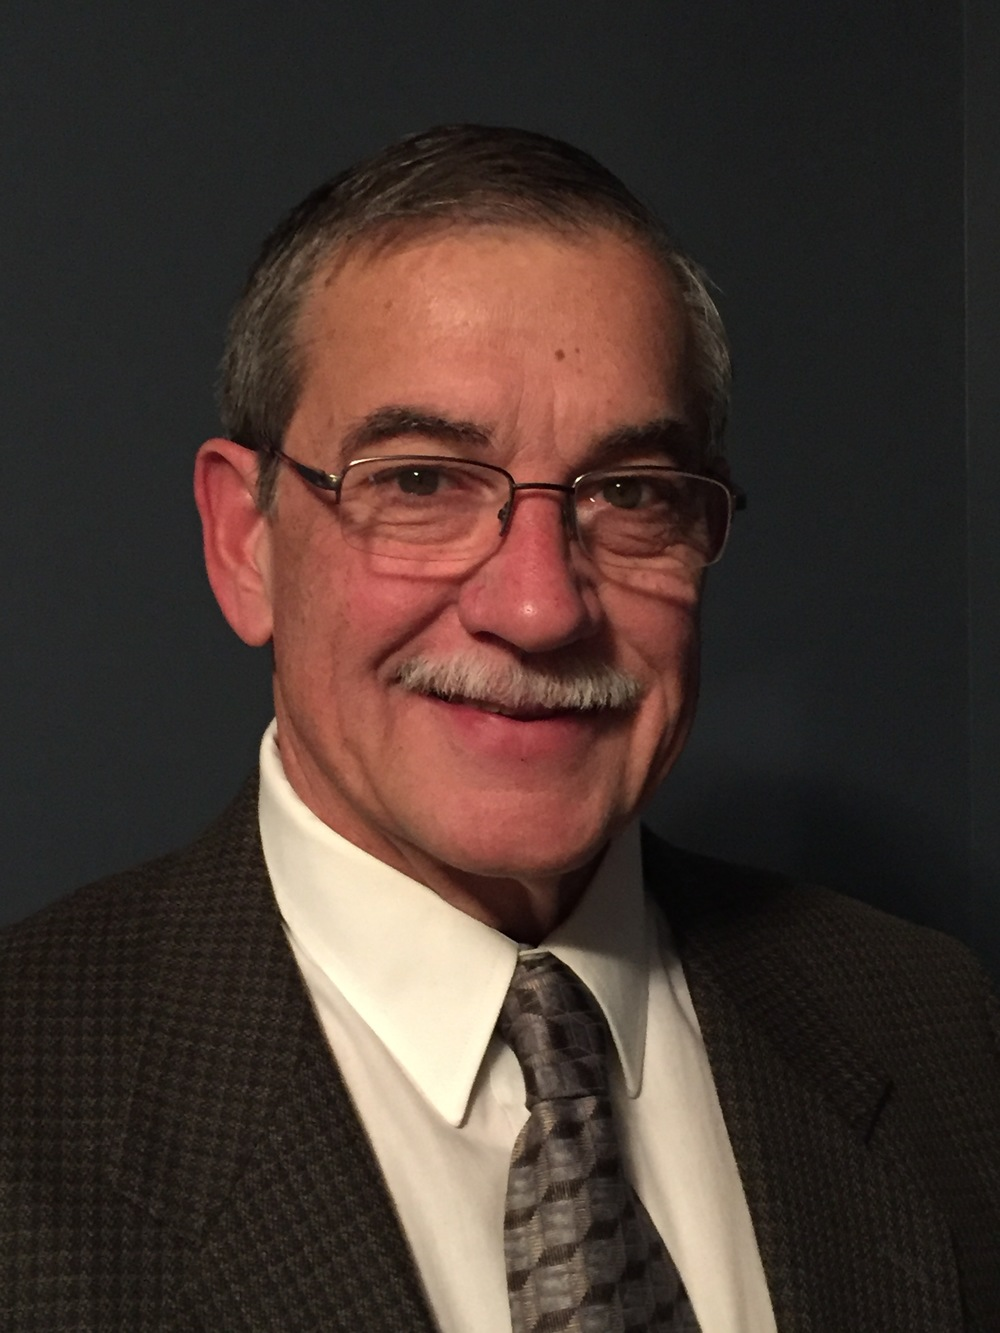 Steve Shanahan, Branch Manager, Shanahan Mechanical and Electrical Inc.